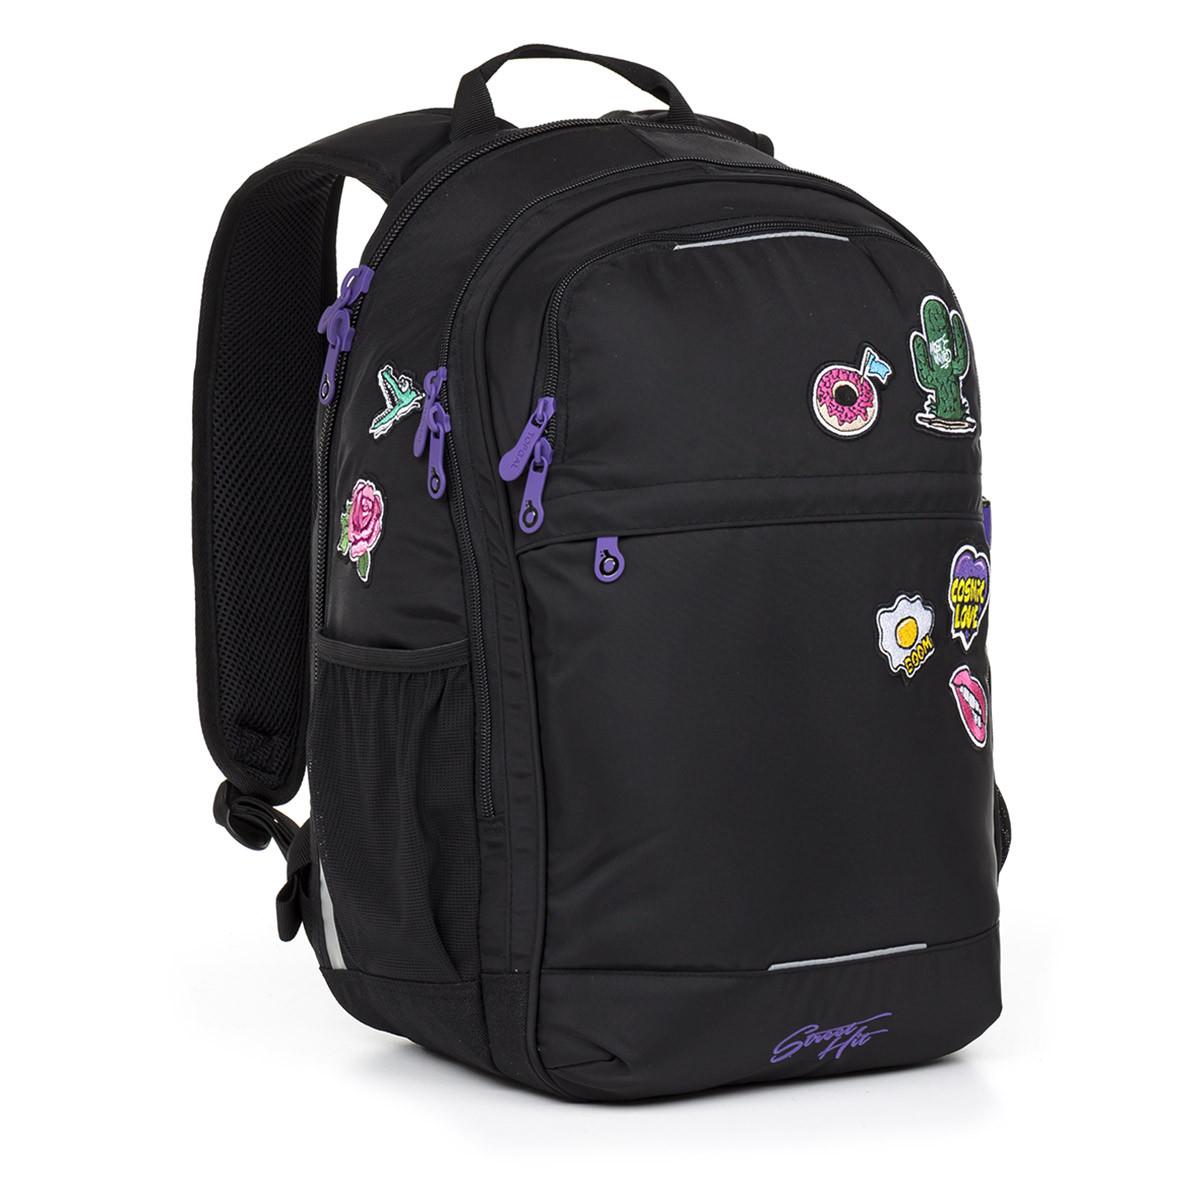 Studentský batoh Topgal - RUBI17007 G  c435b11420